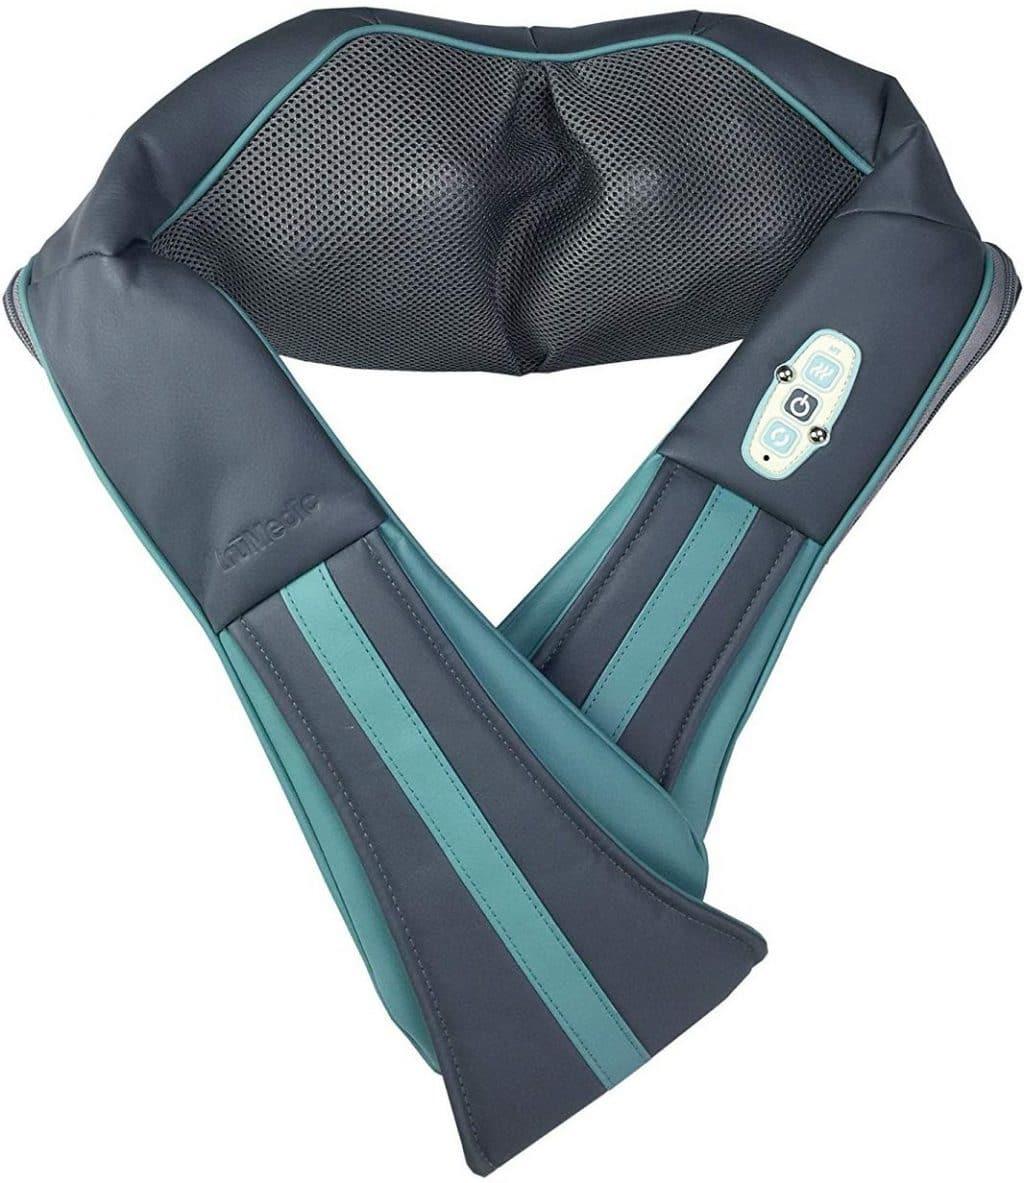 TrūMedic® InstaShiatsu Plus Neck And Shoulder Massager